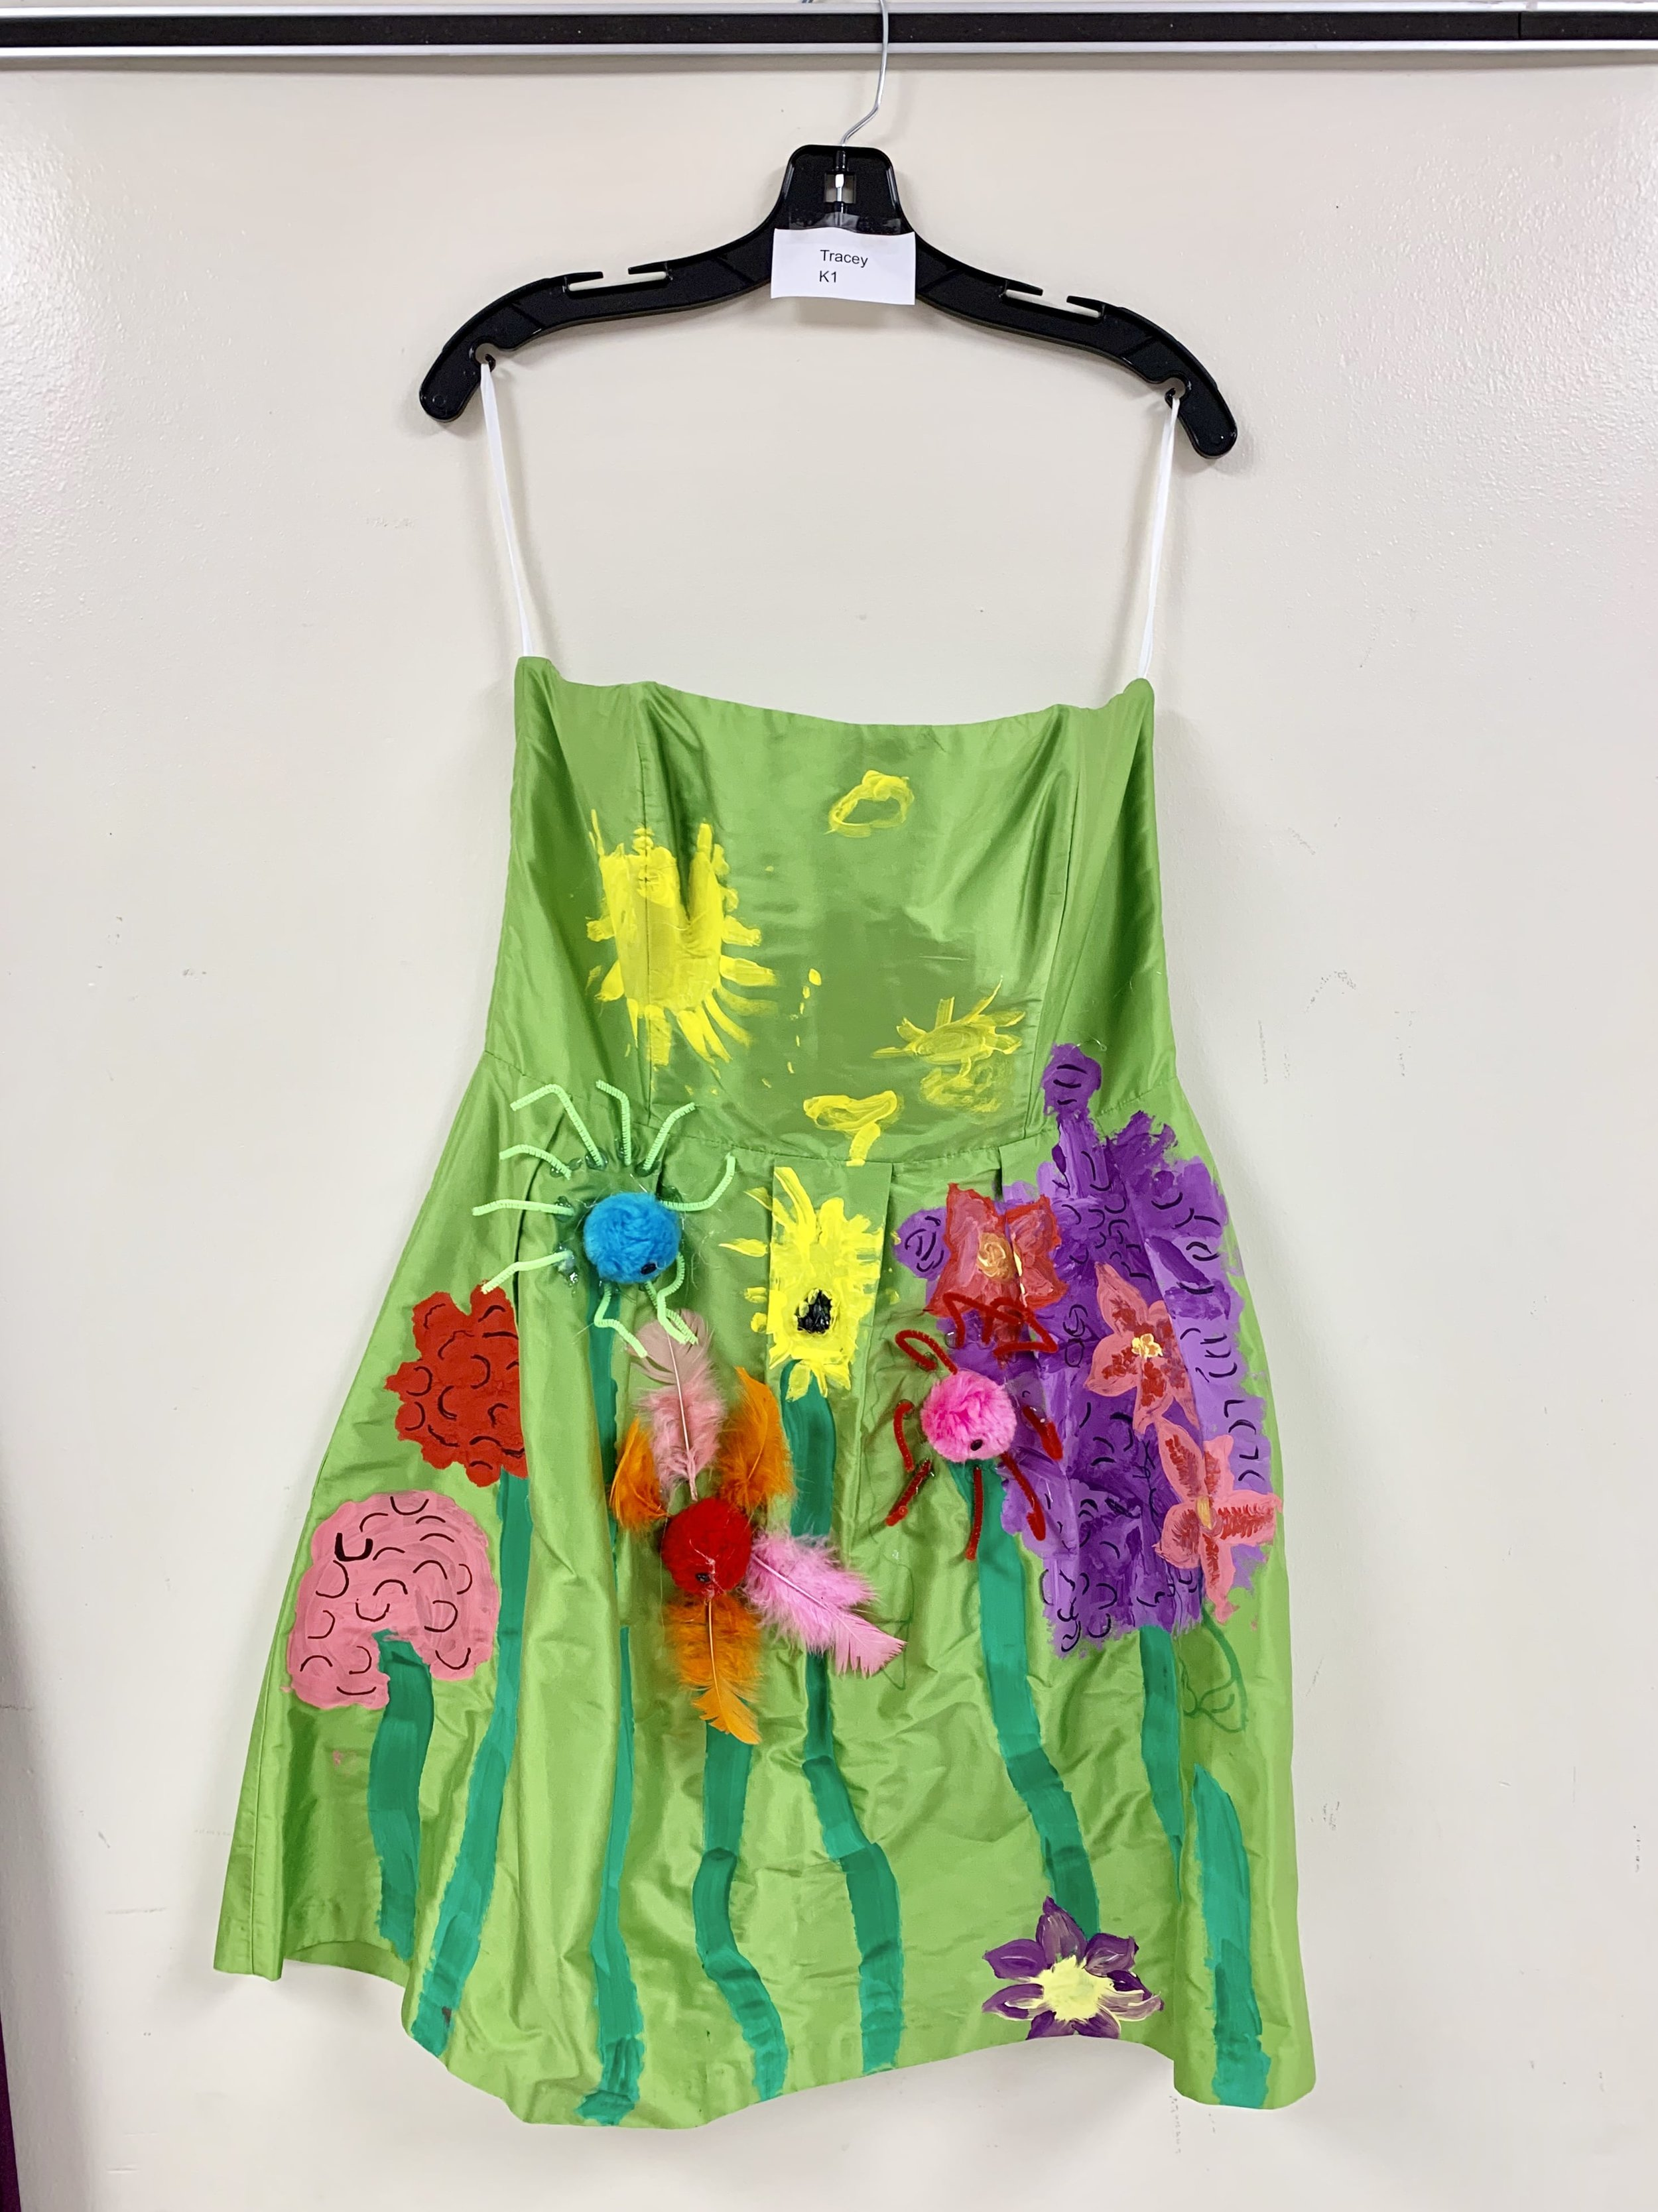 Kindergarteners decorate dress in art education unit